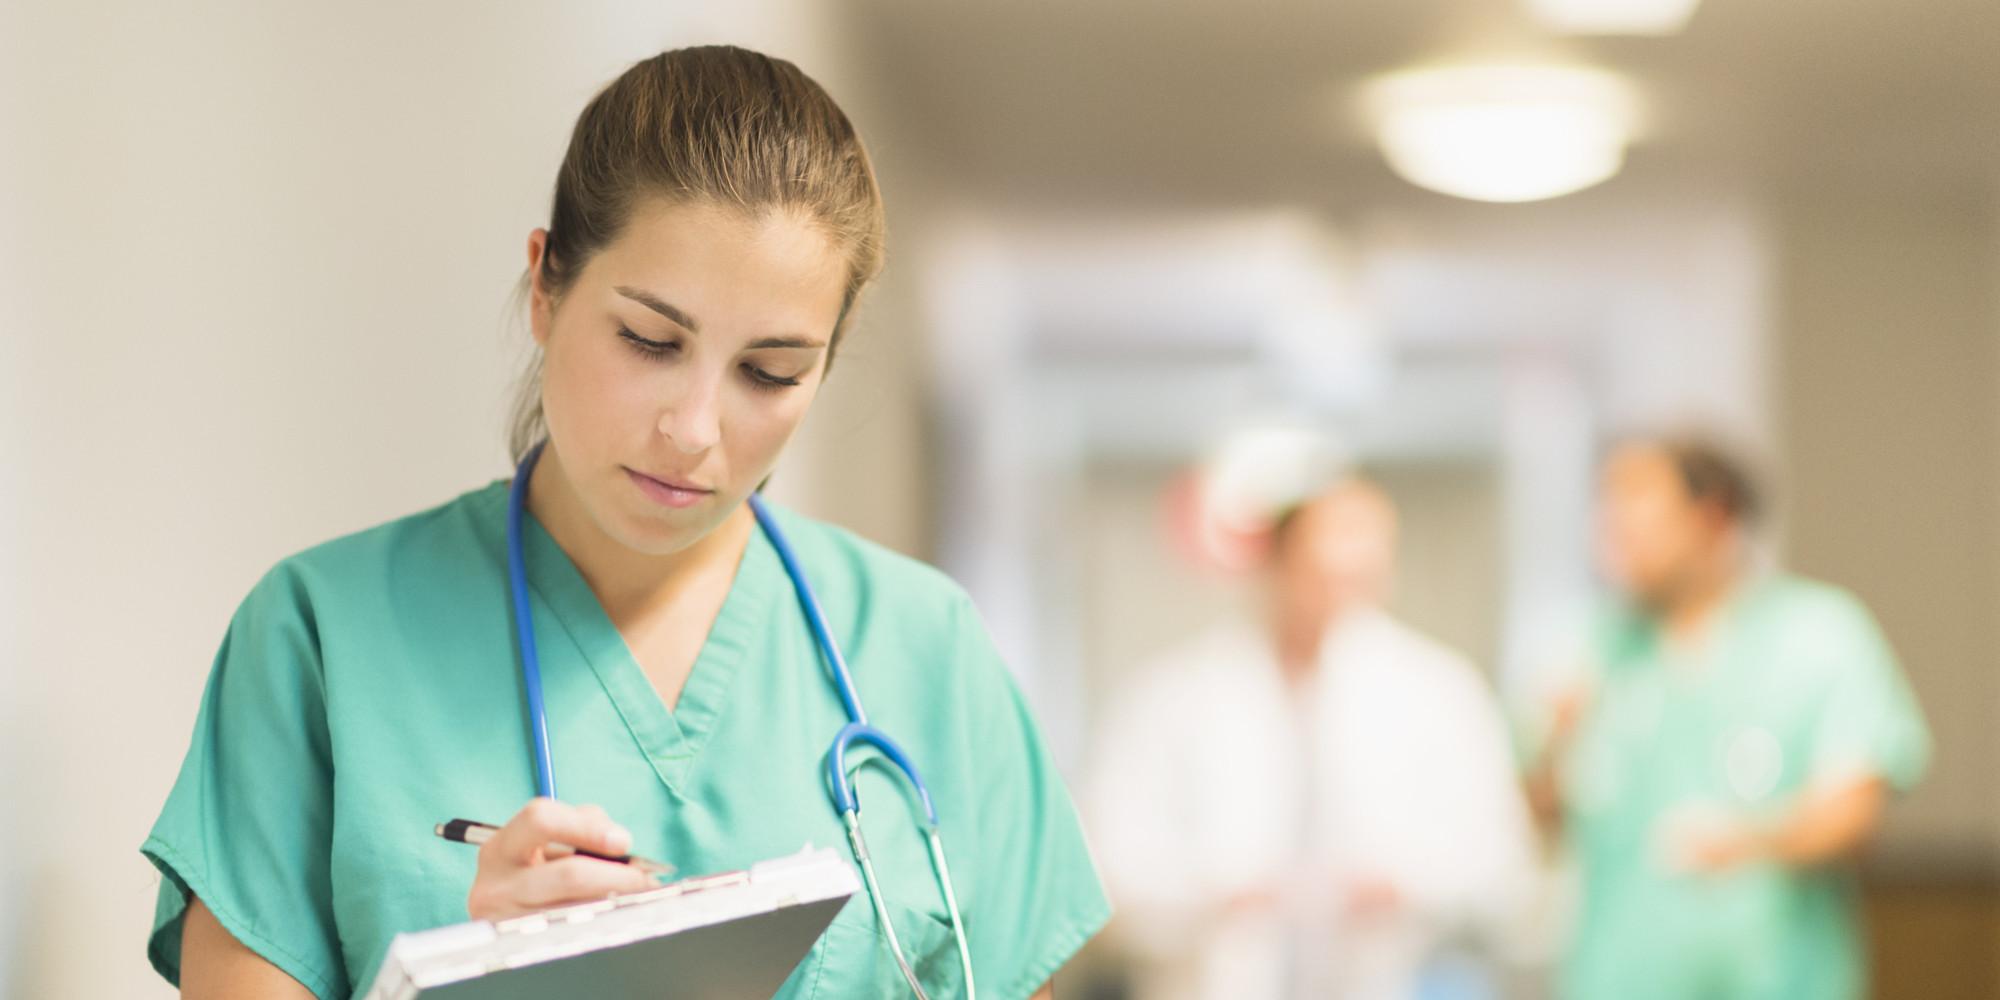 Nurse HD wallpapers, Desktop wallpaper - most viewed